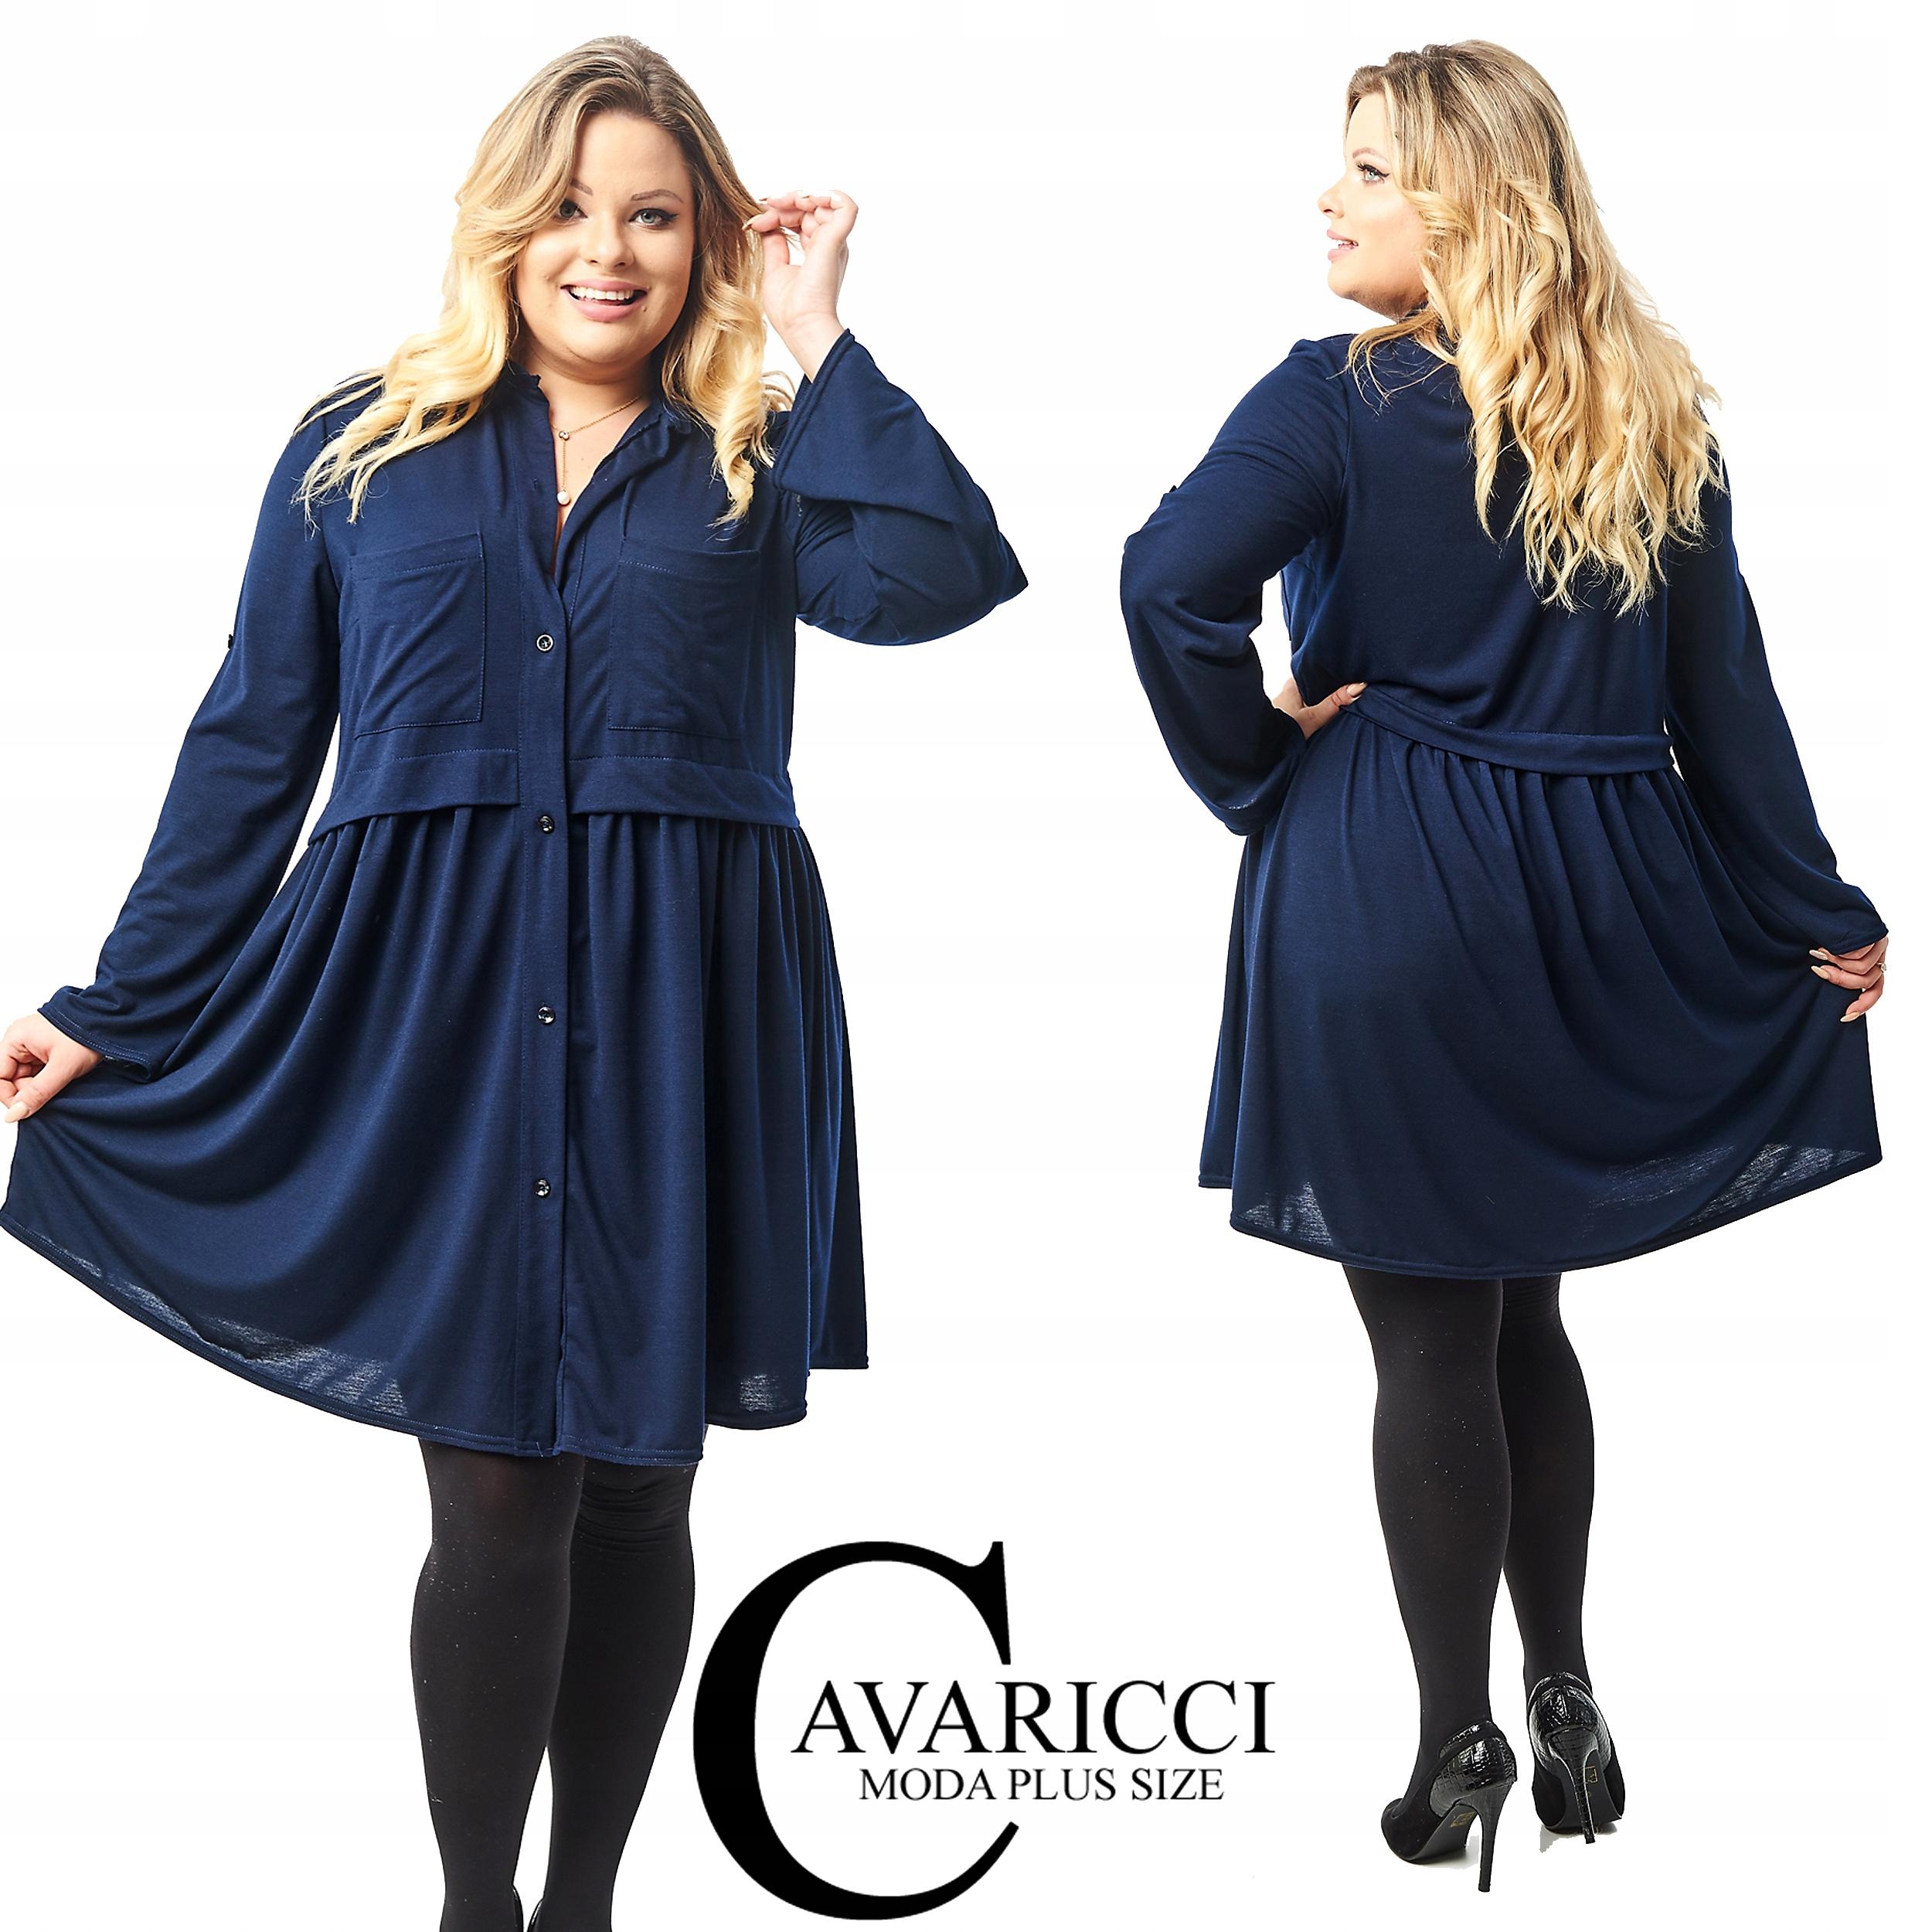 dc6feeb81b CAVARICCI PLUS SIZE suknia ZARKA S-62 XXL XXXL 7577459614 - Allegro.pl